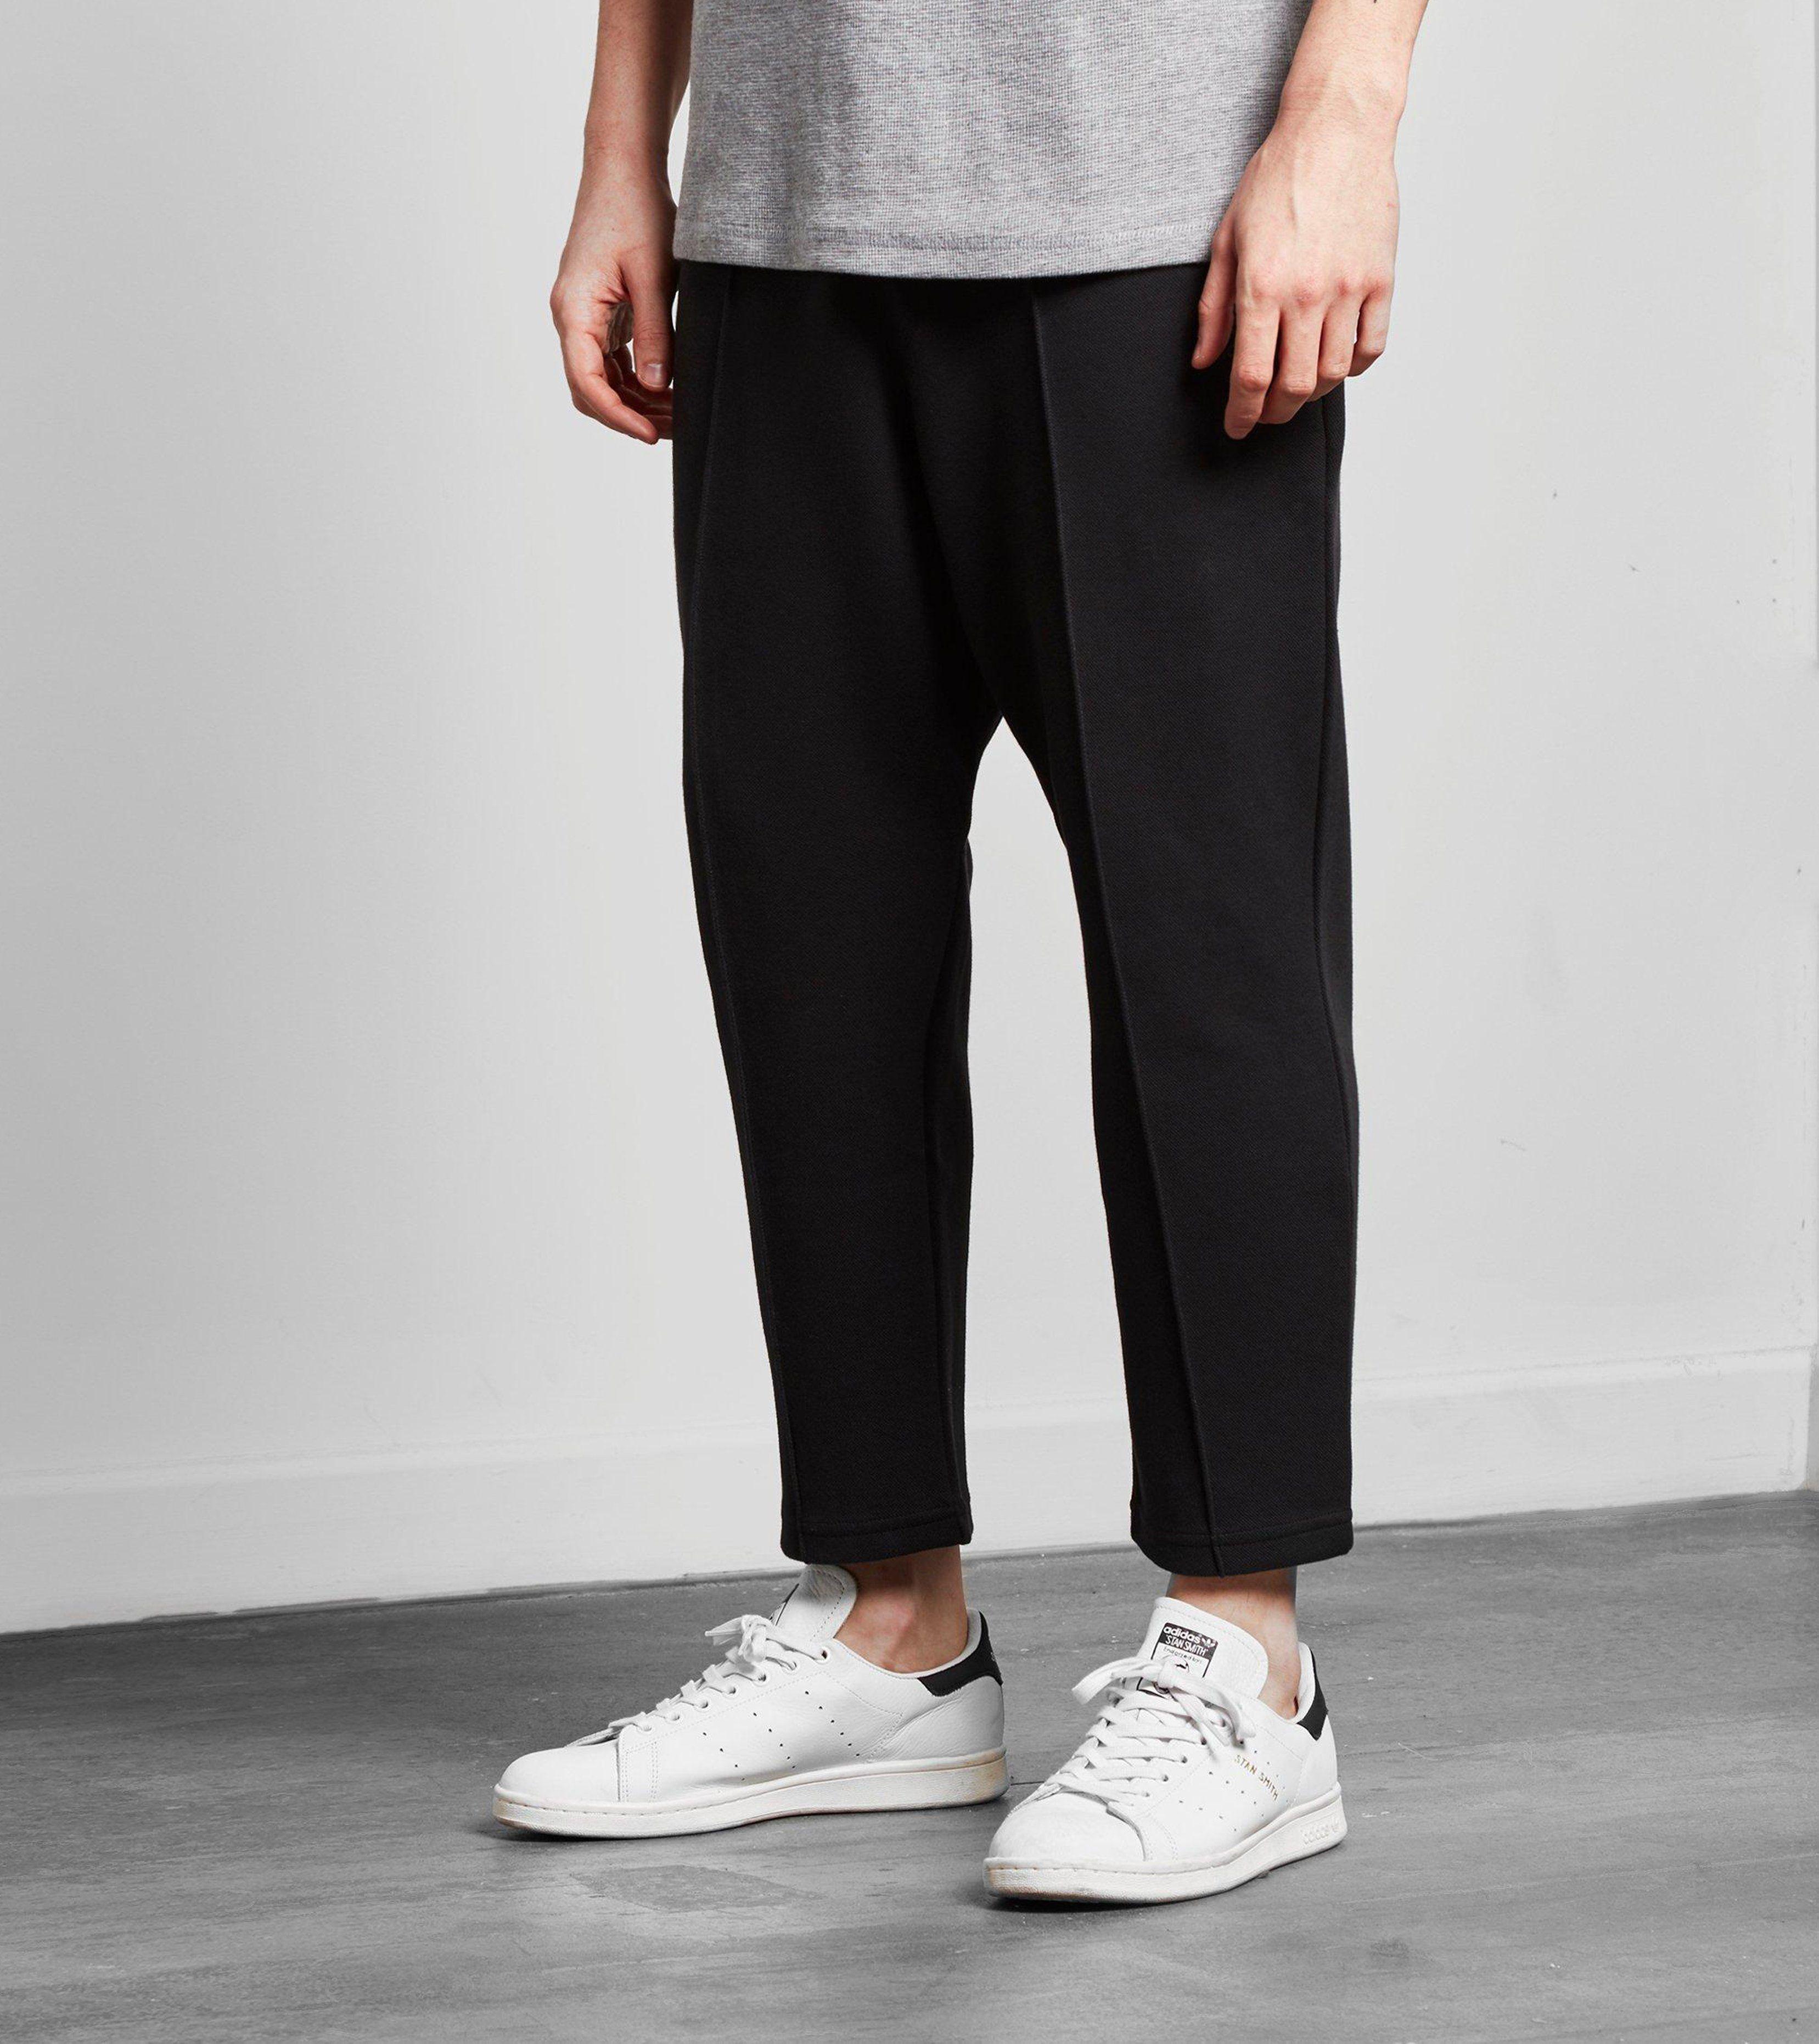 f651a514d9 adidas Originals Cropped Pintuck Pants   Size?